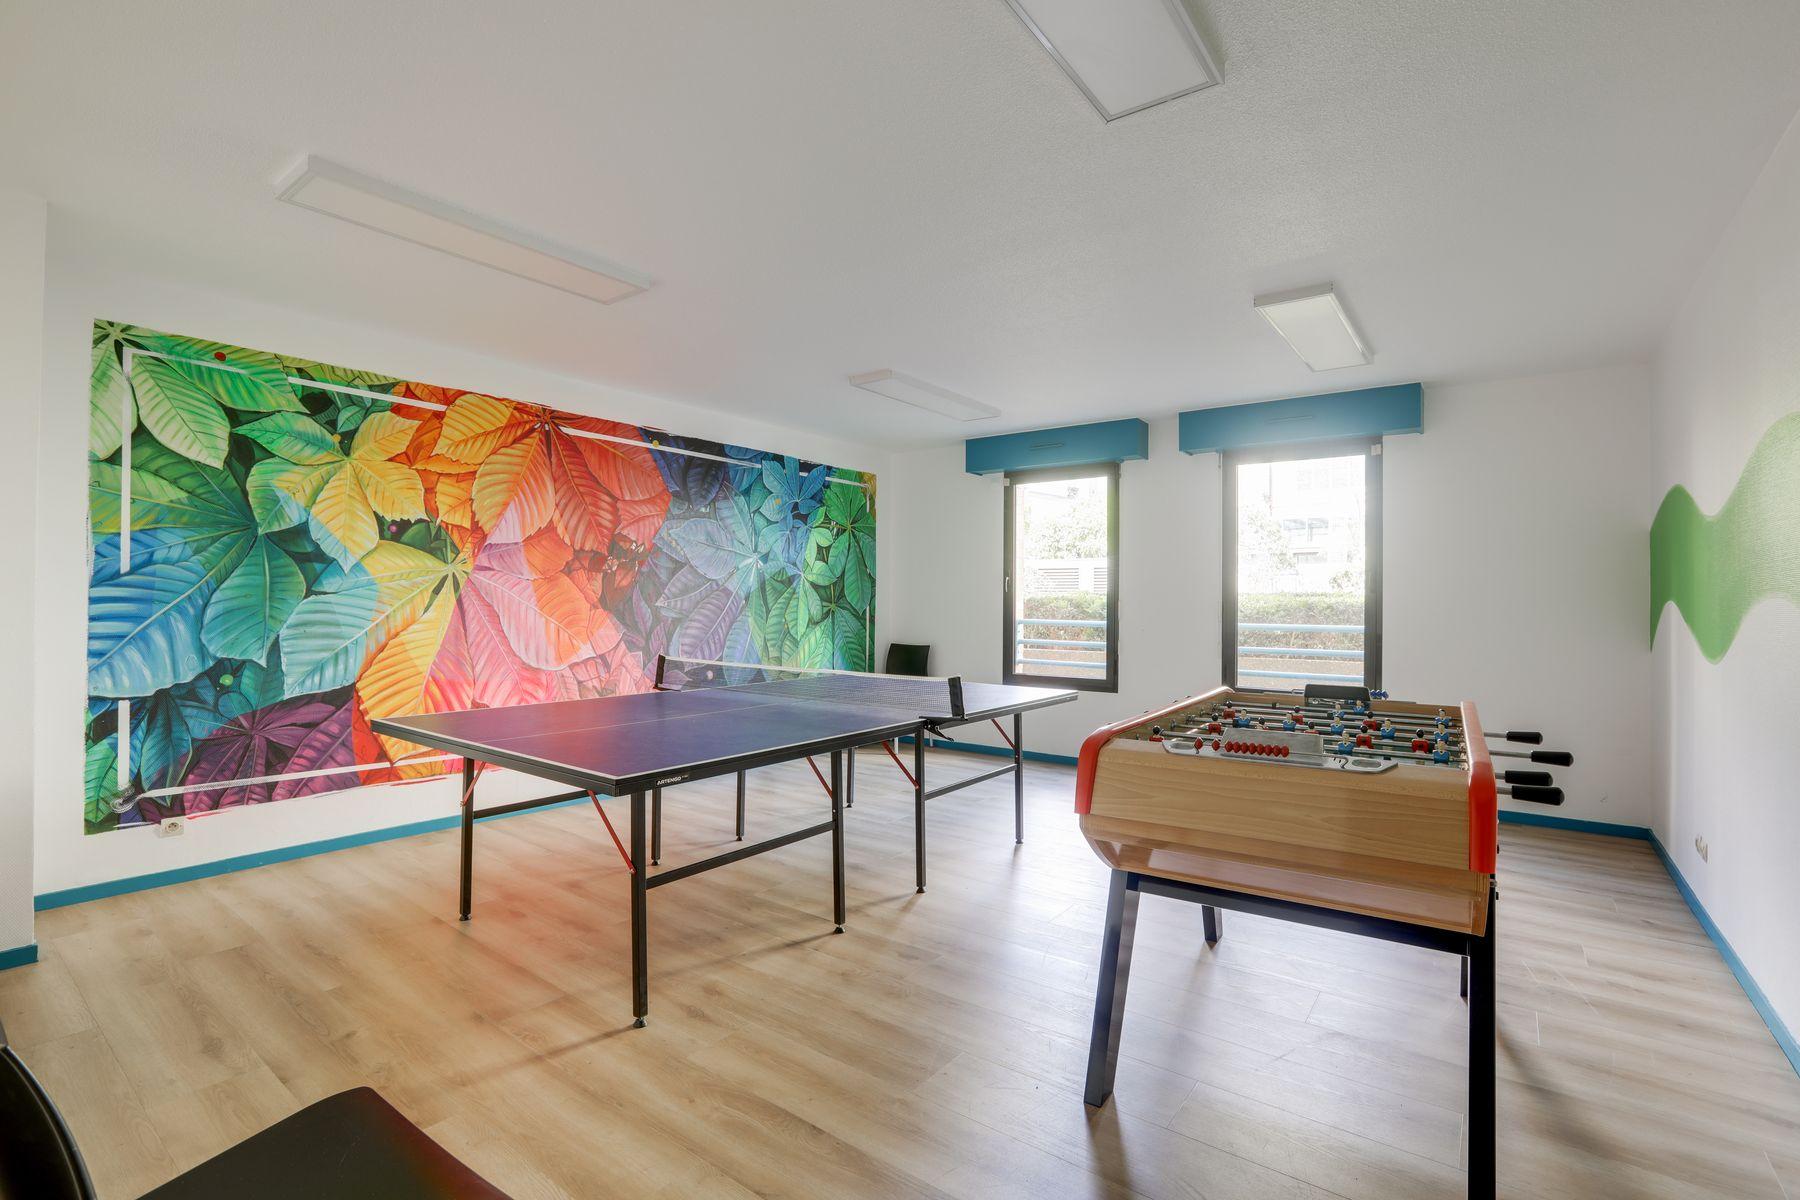 LOGIFAC résidence étudiante Corneille Rouen ping-pong baby-foot